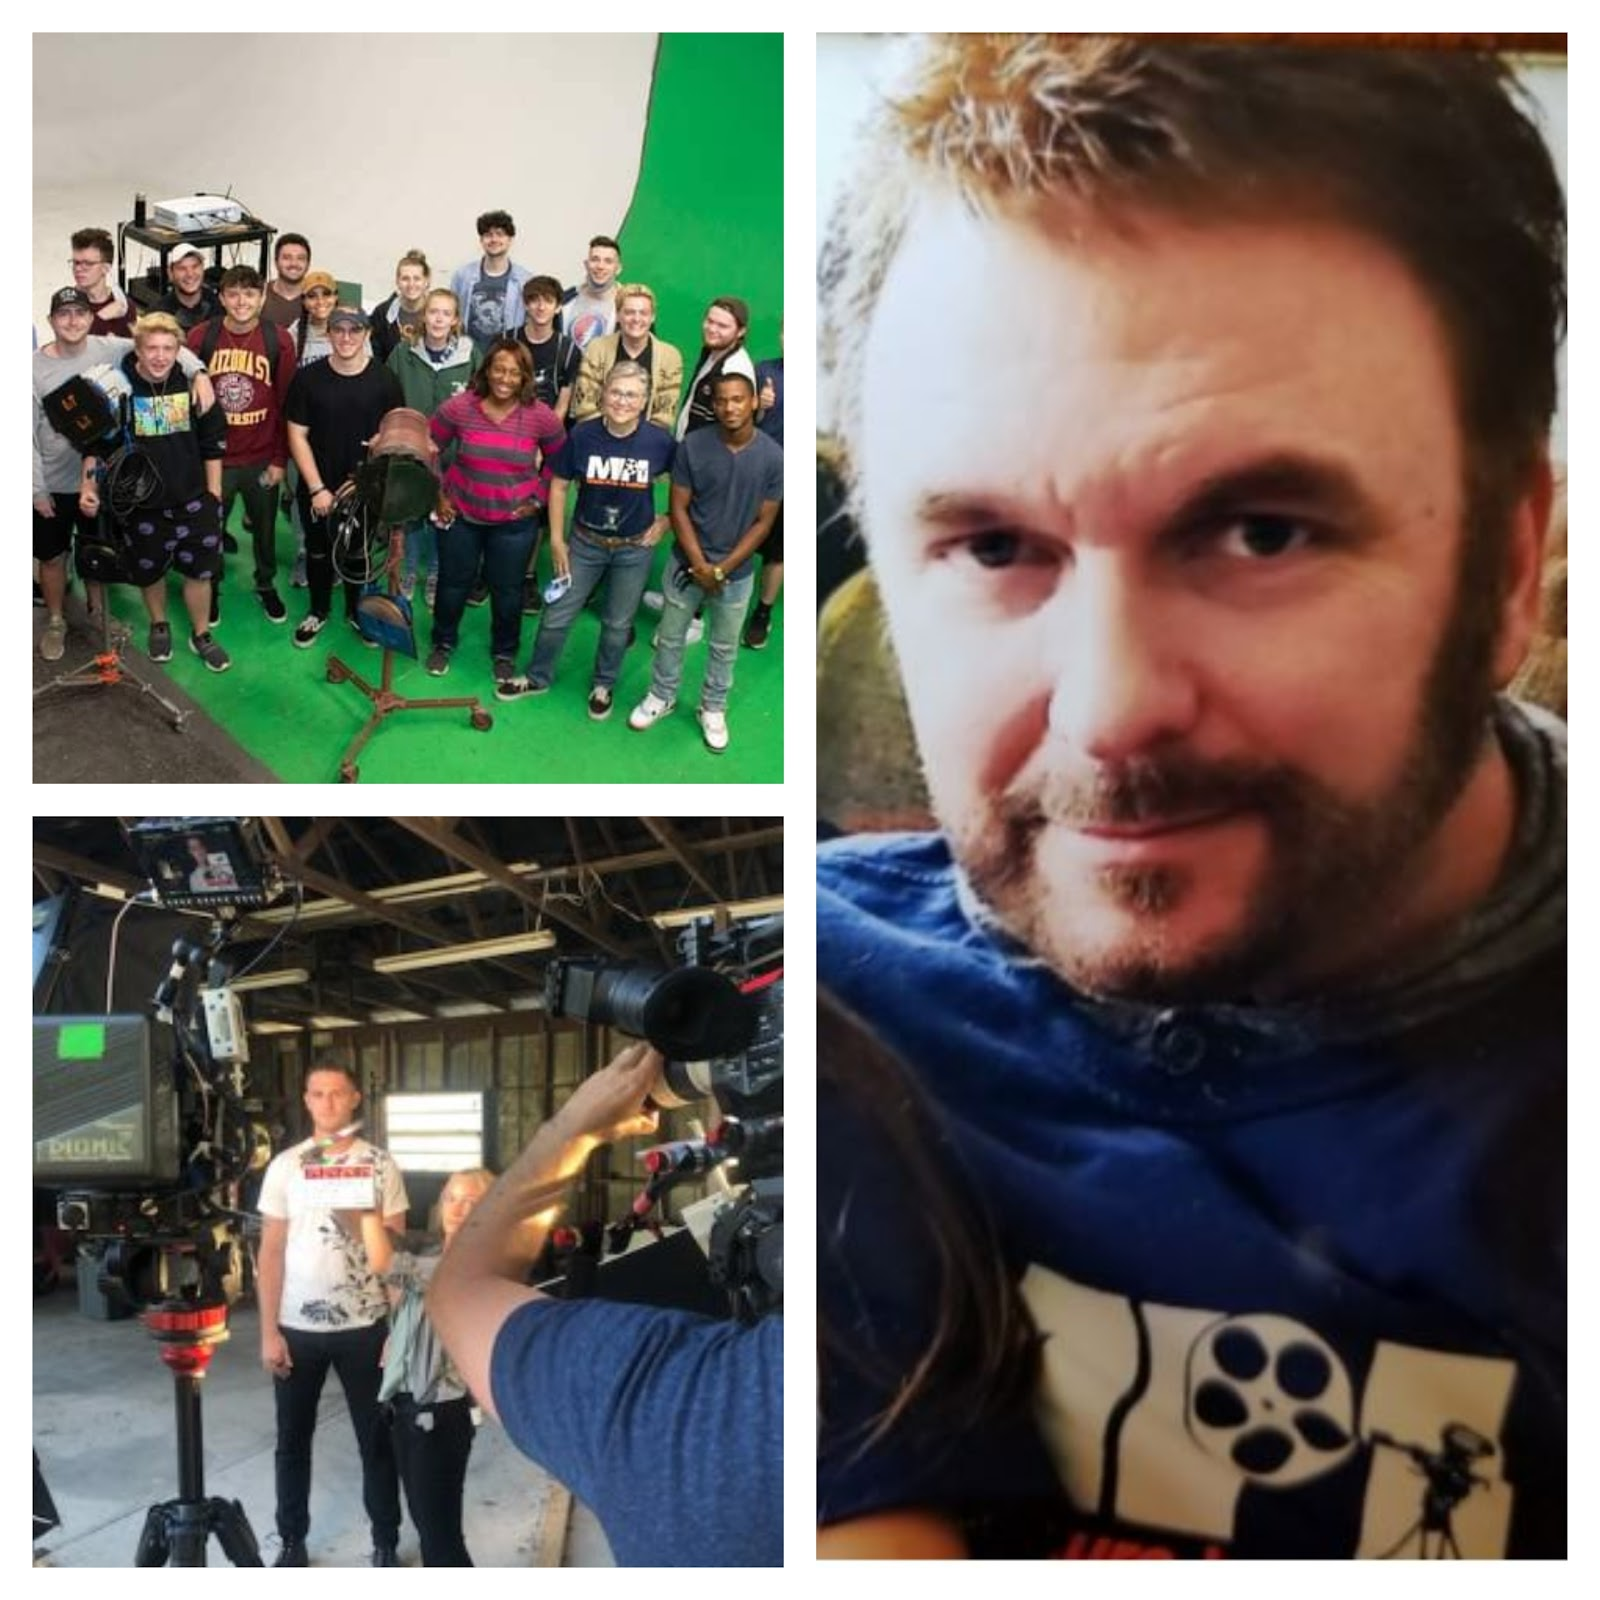 On-set Training Is the Foundation of Filmmaking - Blog - Motion Picture Institute - oVNCWXAhyS48wIv1-0BgjV9fZuOh6r69FJLk81Rr5RfdutQmxrOu6wzWItFEKUnWNIyAi-1l_F-kVozEO45_XzvY4f35VyK3c5RyaQVQzTPFraSyBotufImn6ofWWBOFfW60g0xf